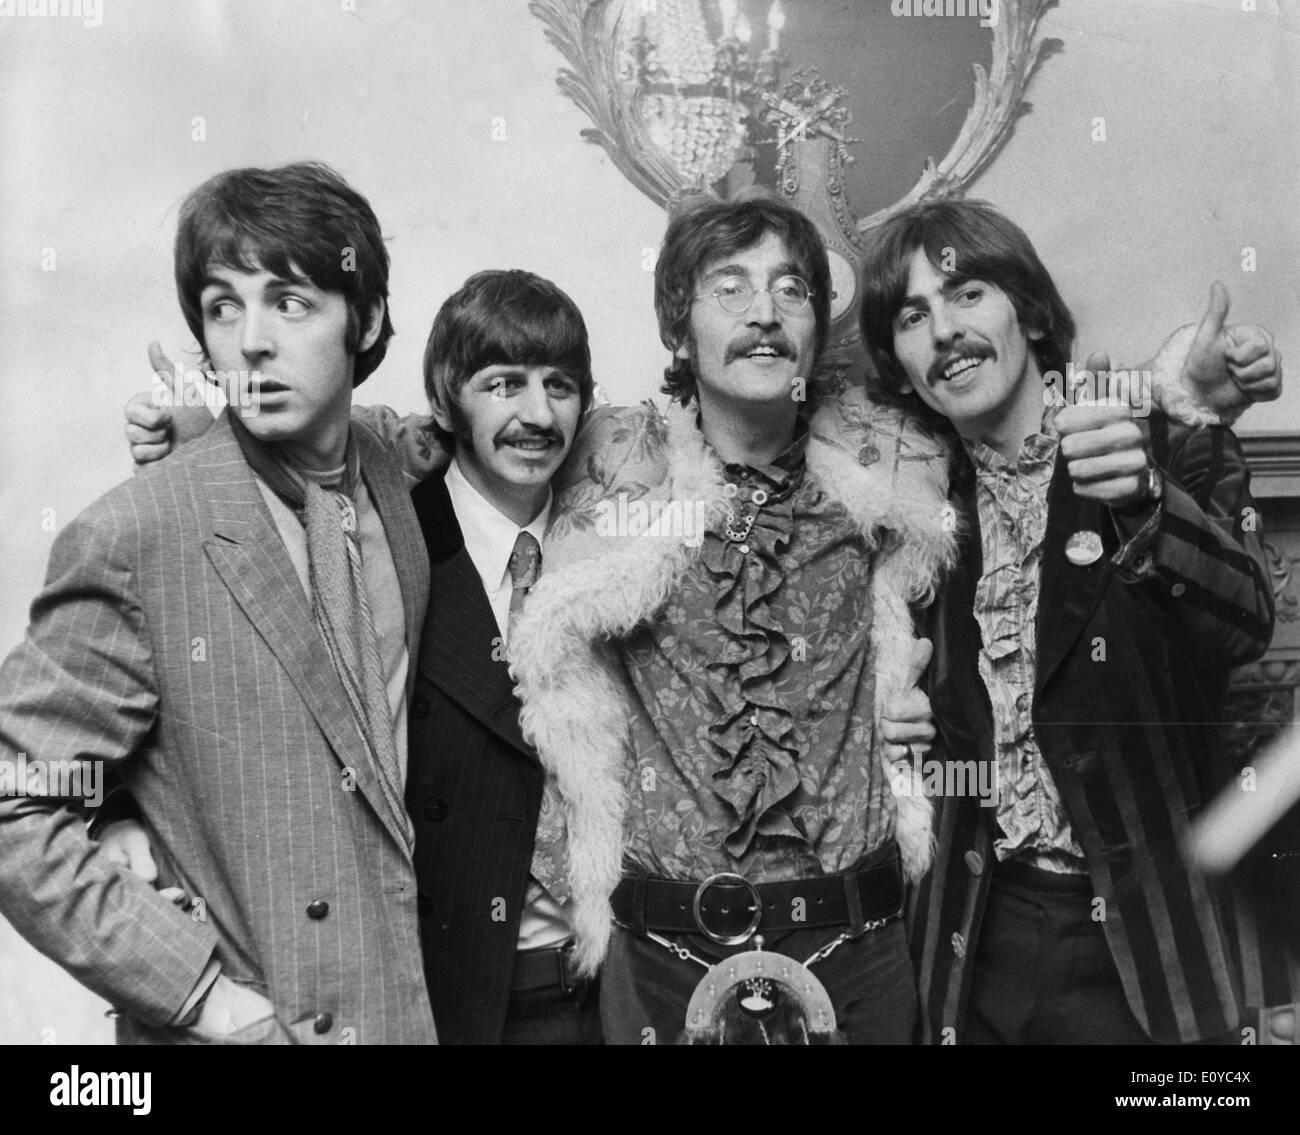 Paul McCartney, Ringo Starr, John Lennon, George Harrison - Stock Image